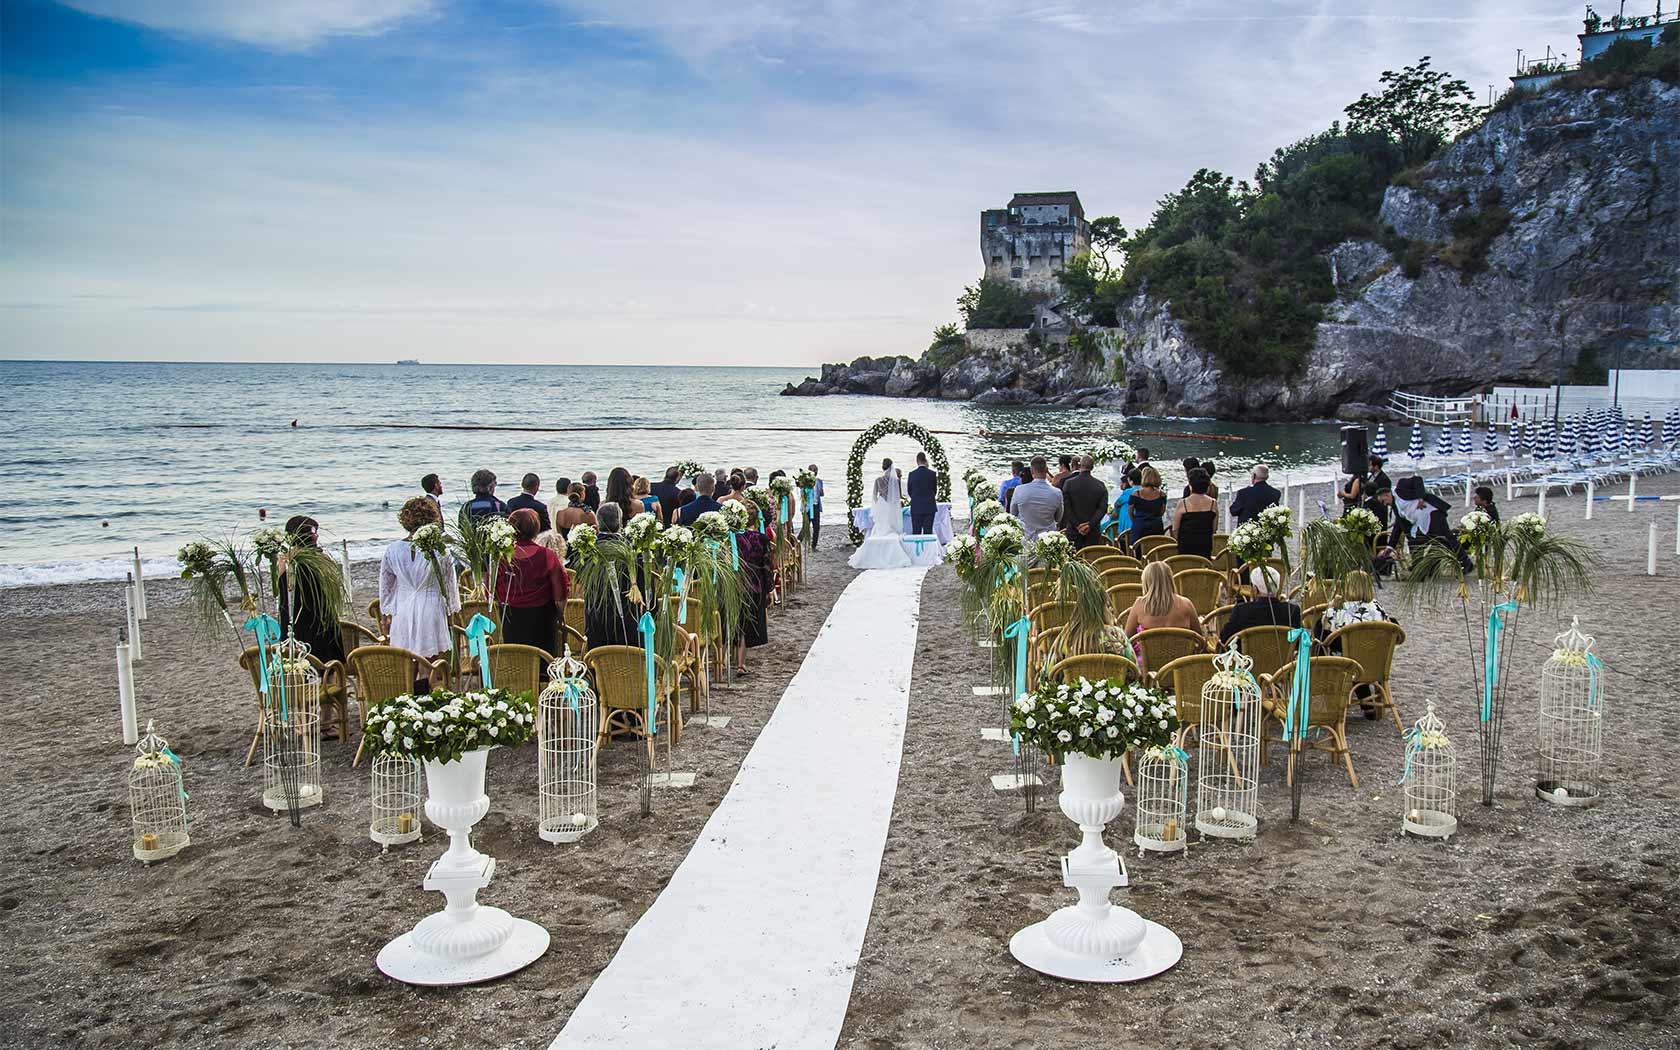 Matrimoni Costiera Amalfitana  Cerimonia di nozze sul mare